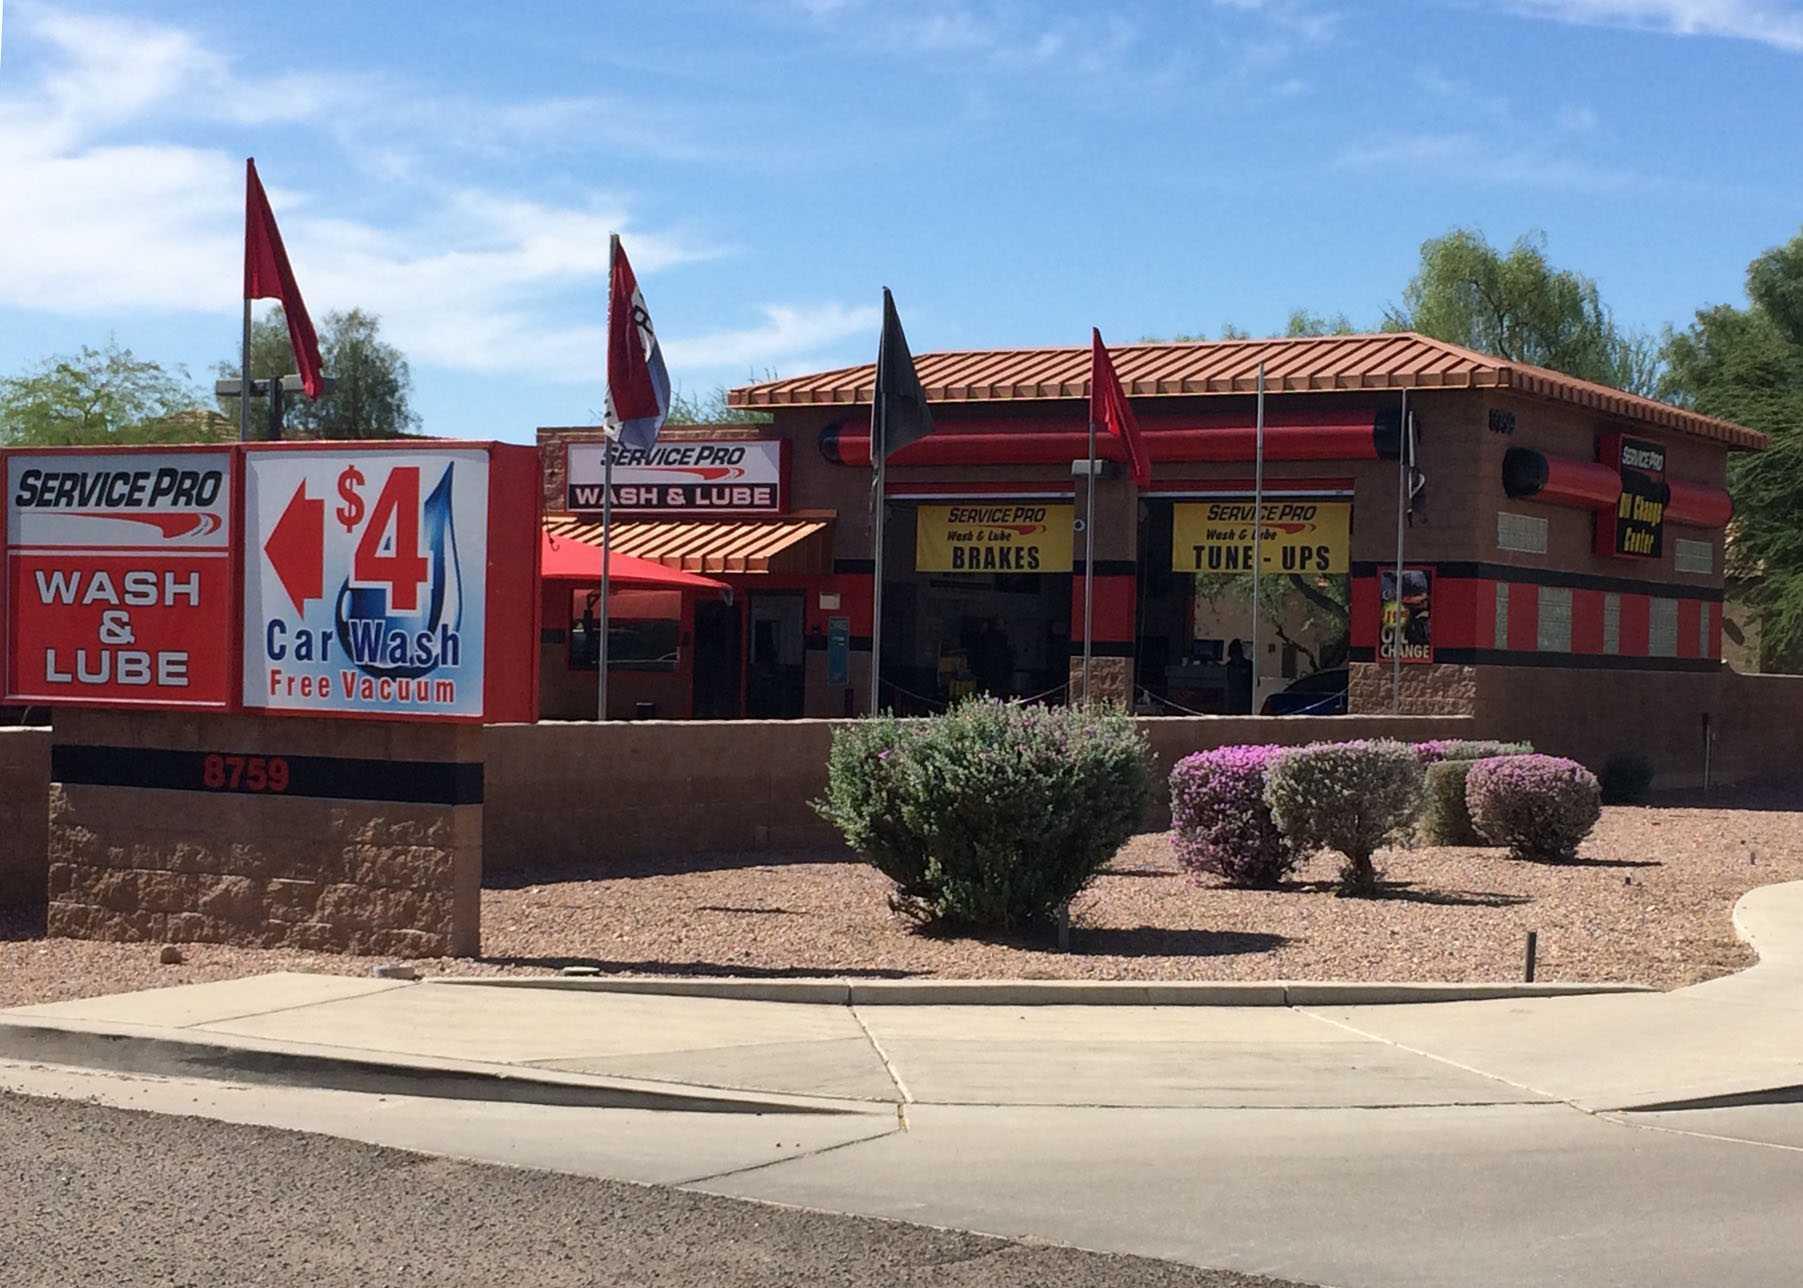 Guardian Interlock 9800 N 91st Ave Ste 110 Peoria, AZ ...